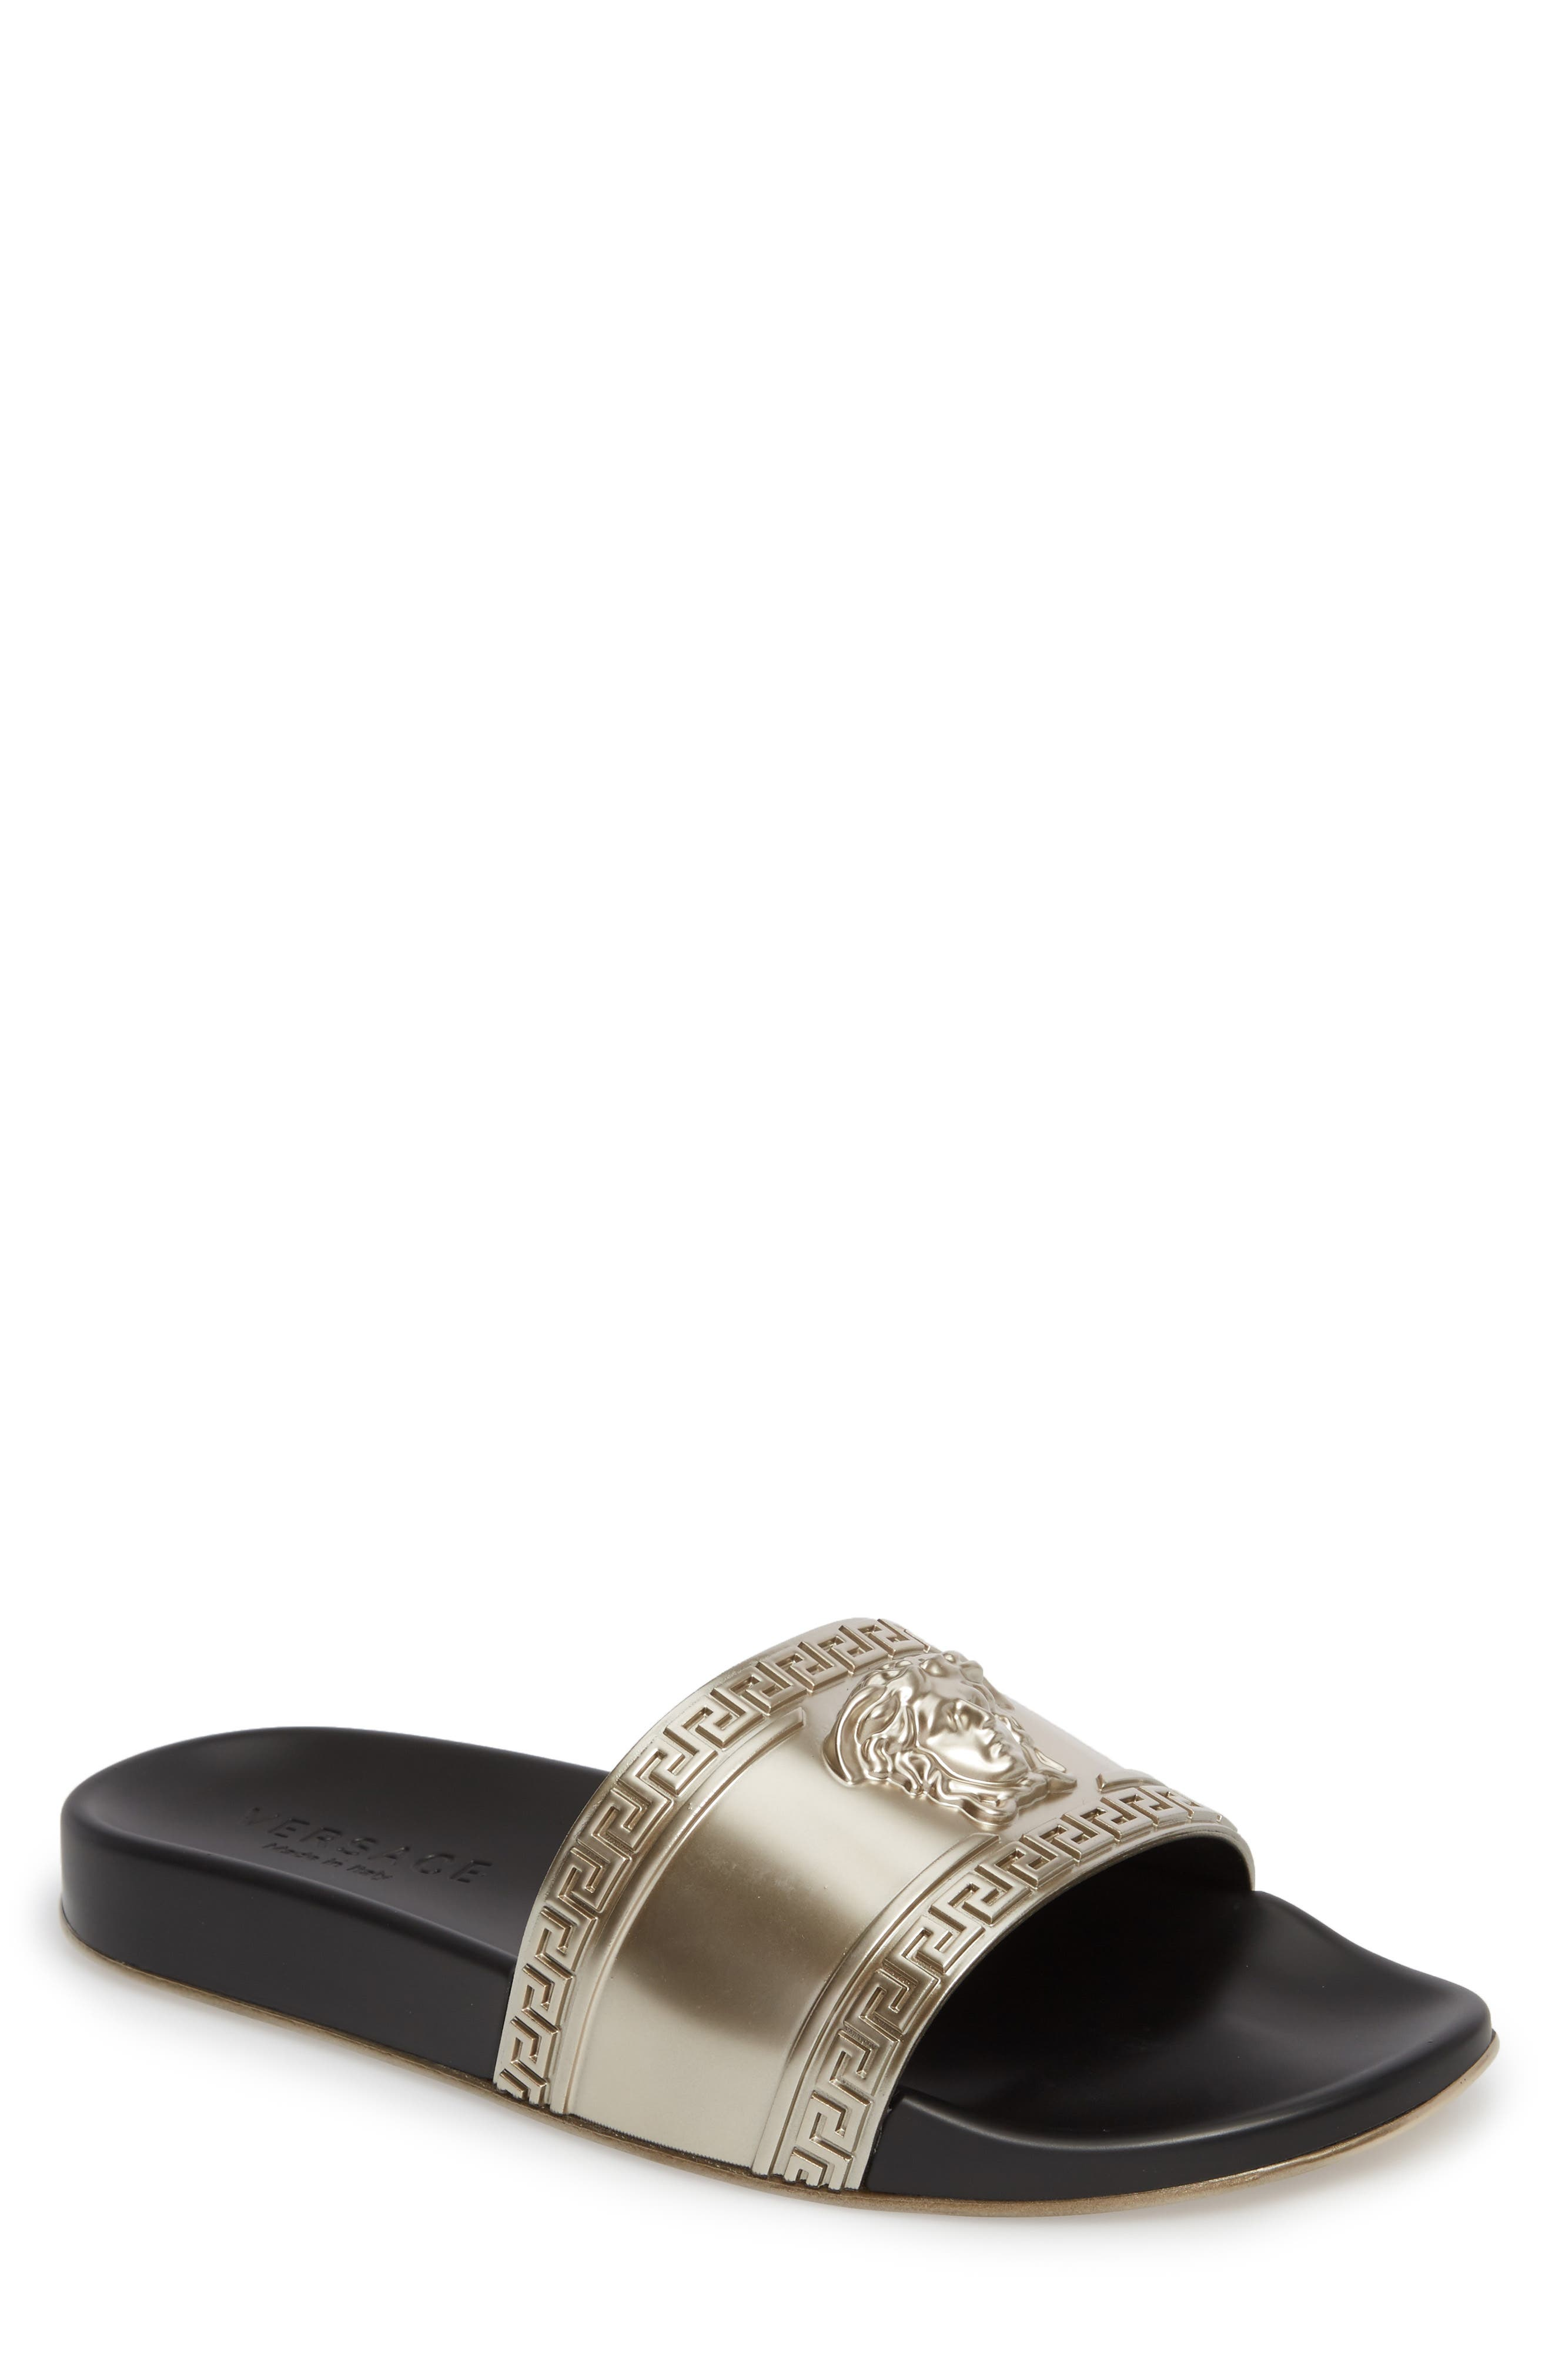 Alternate Image 1 Selected - Versace Palazzo Medusa Slide Sandal (Men)